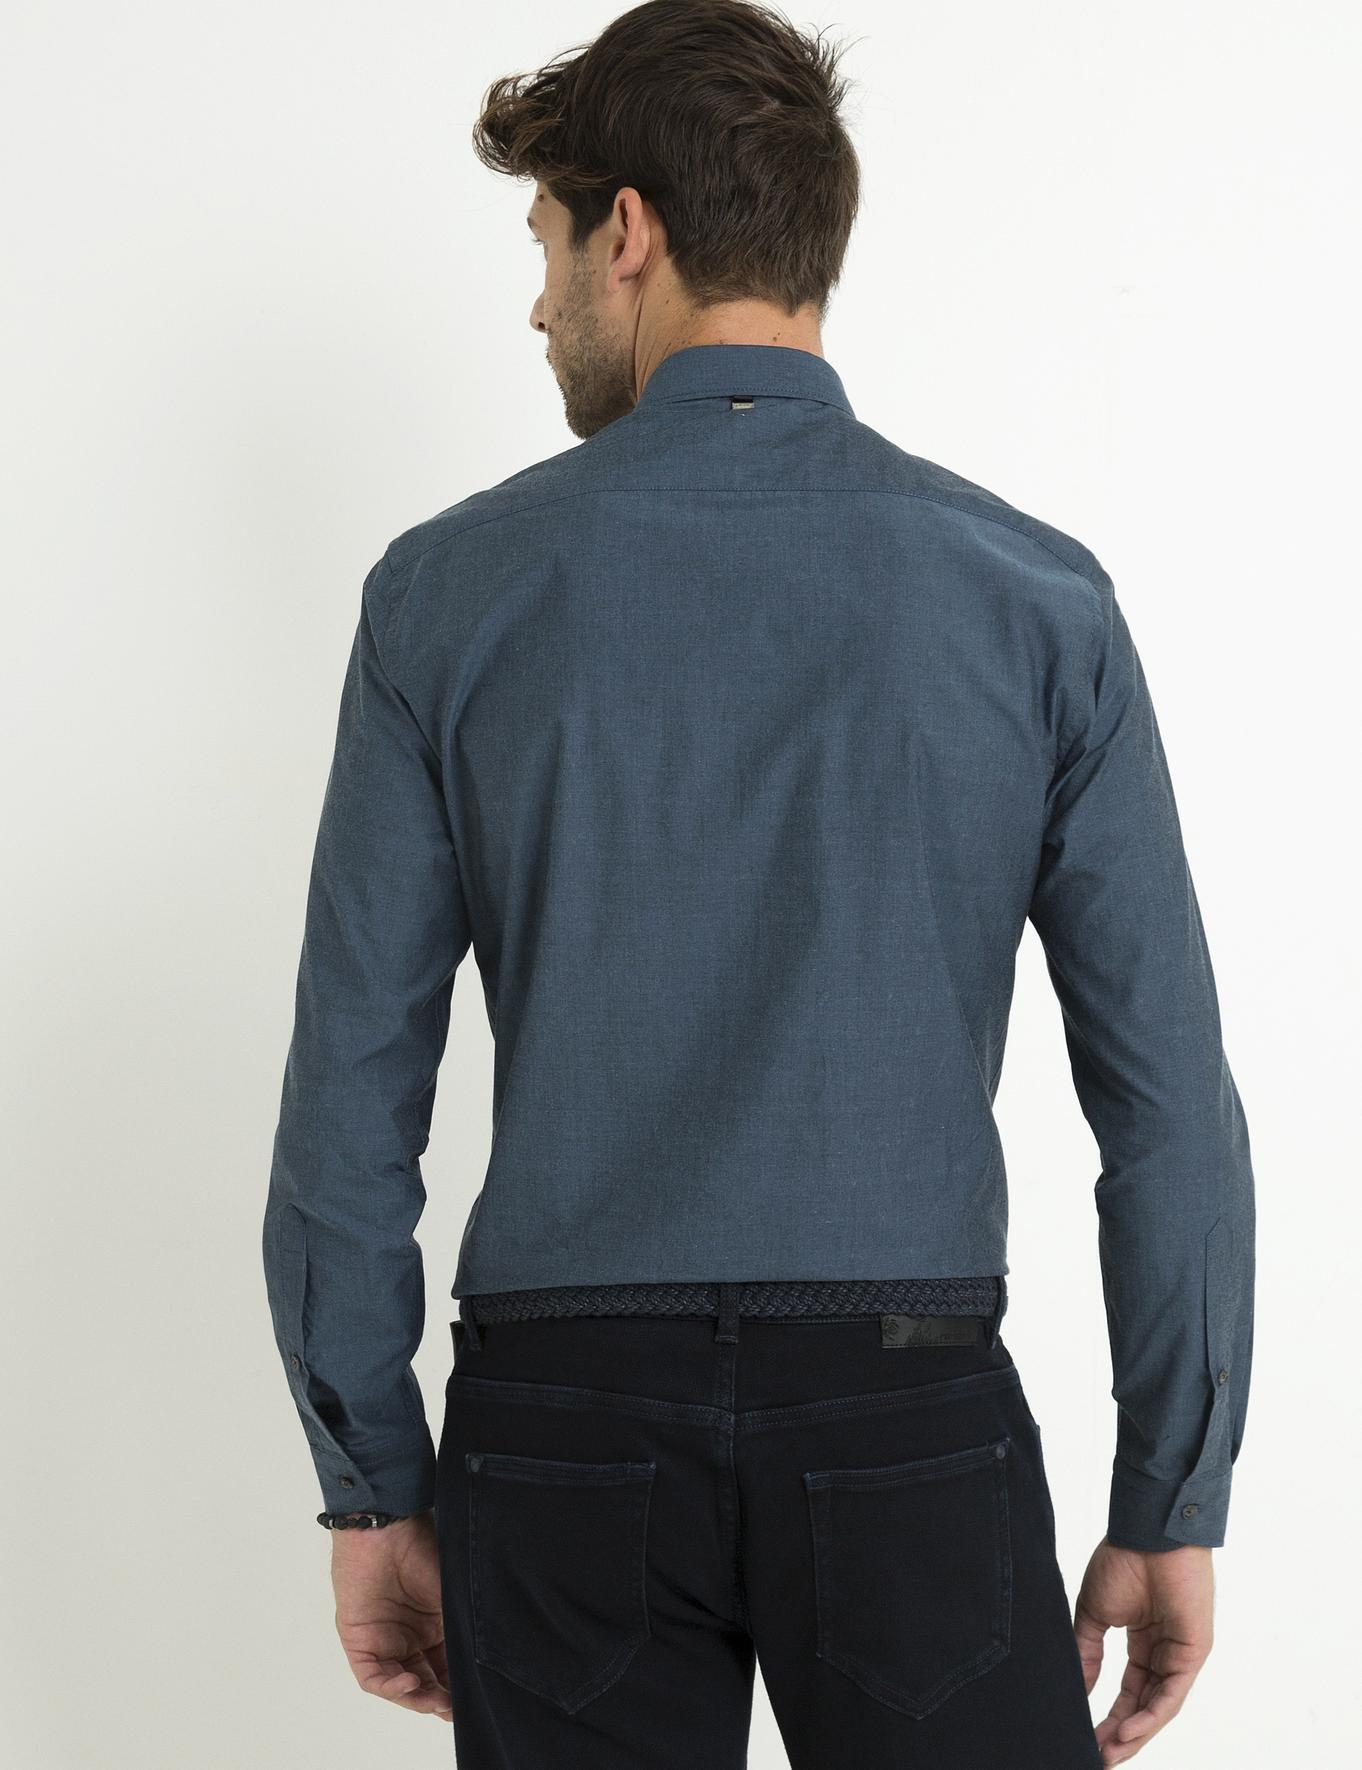 Lacivert Slim Fit Gömlek - 50192756021